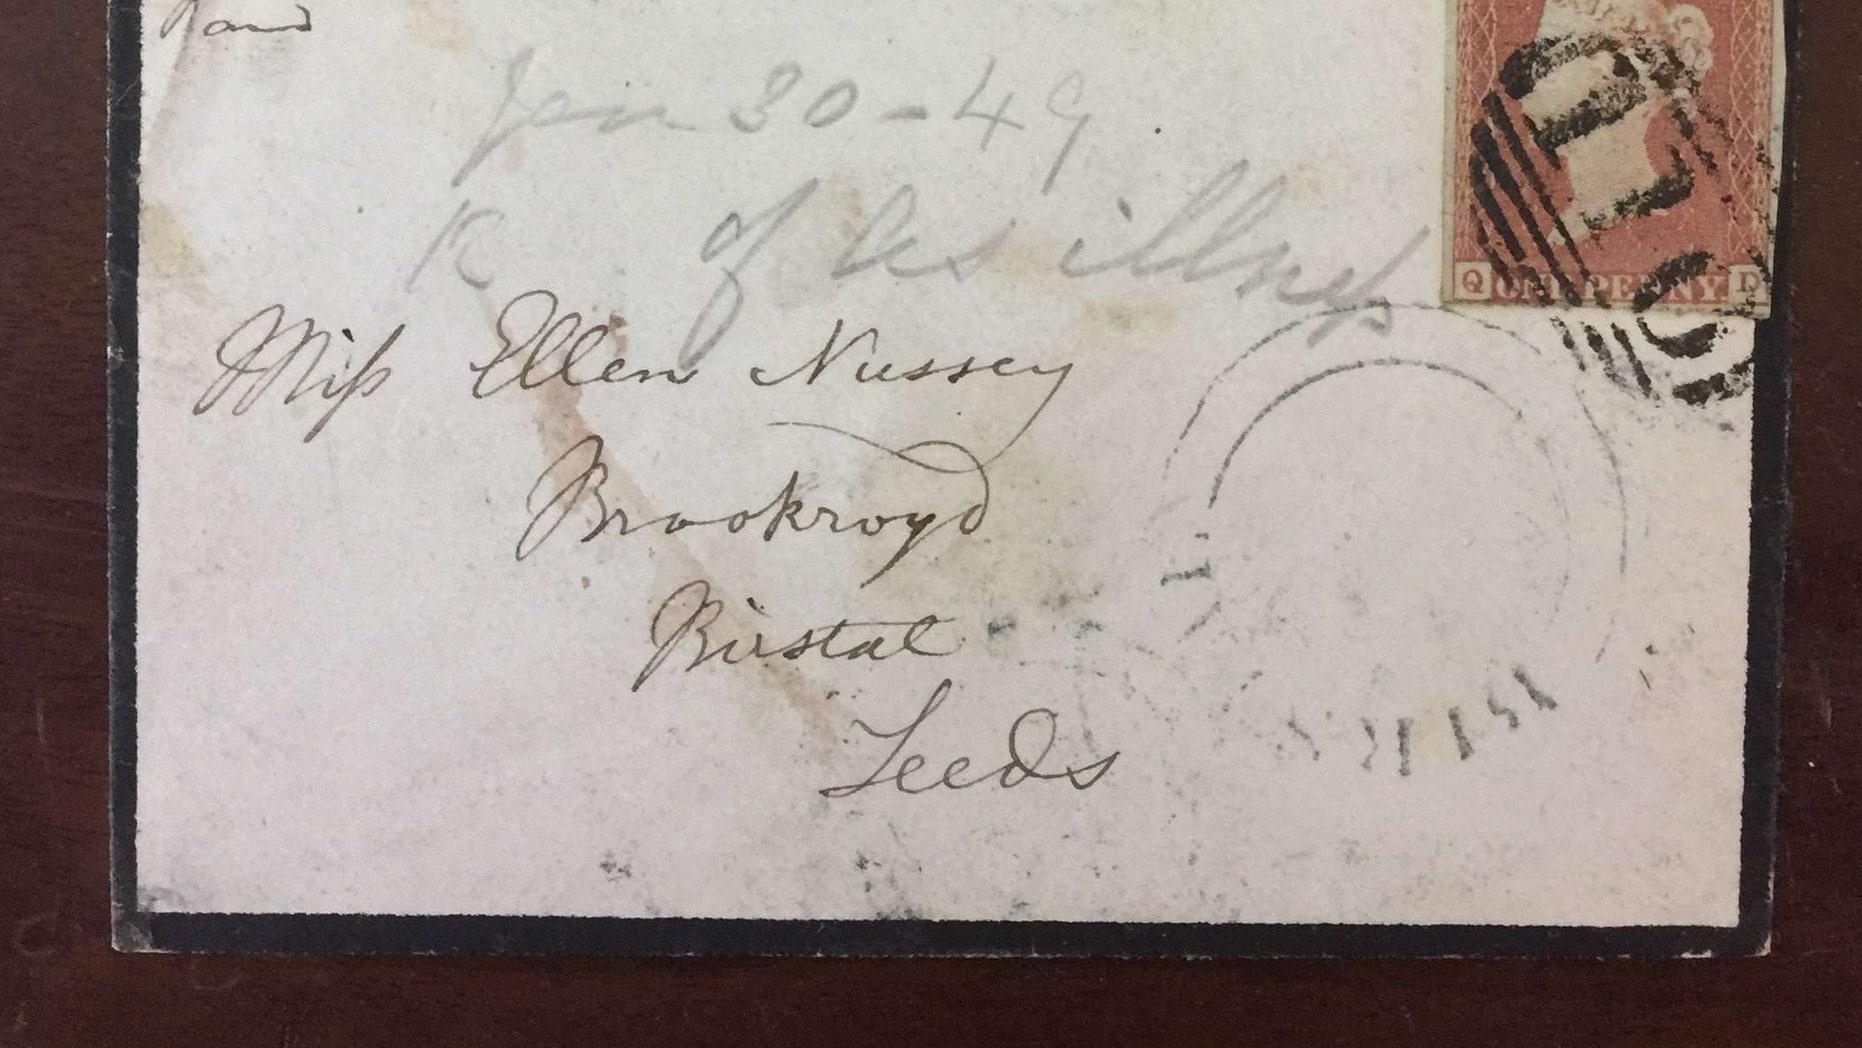 The envelope addressed to Bronte's friend Ellen Nussey postmarked Jan. 30, 1849 (Henry Aldridge & Son).